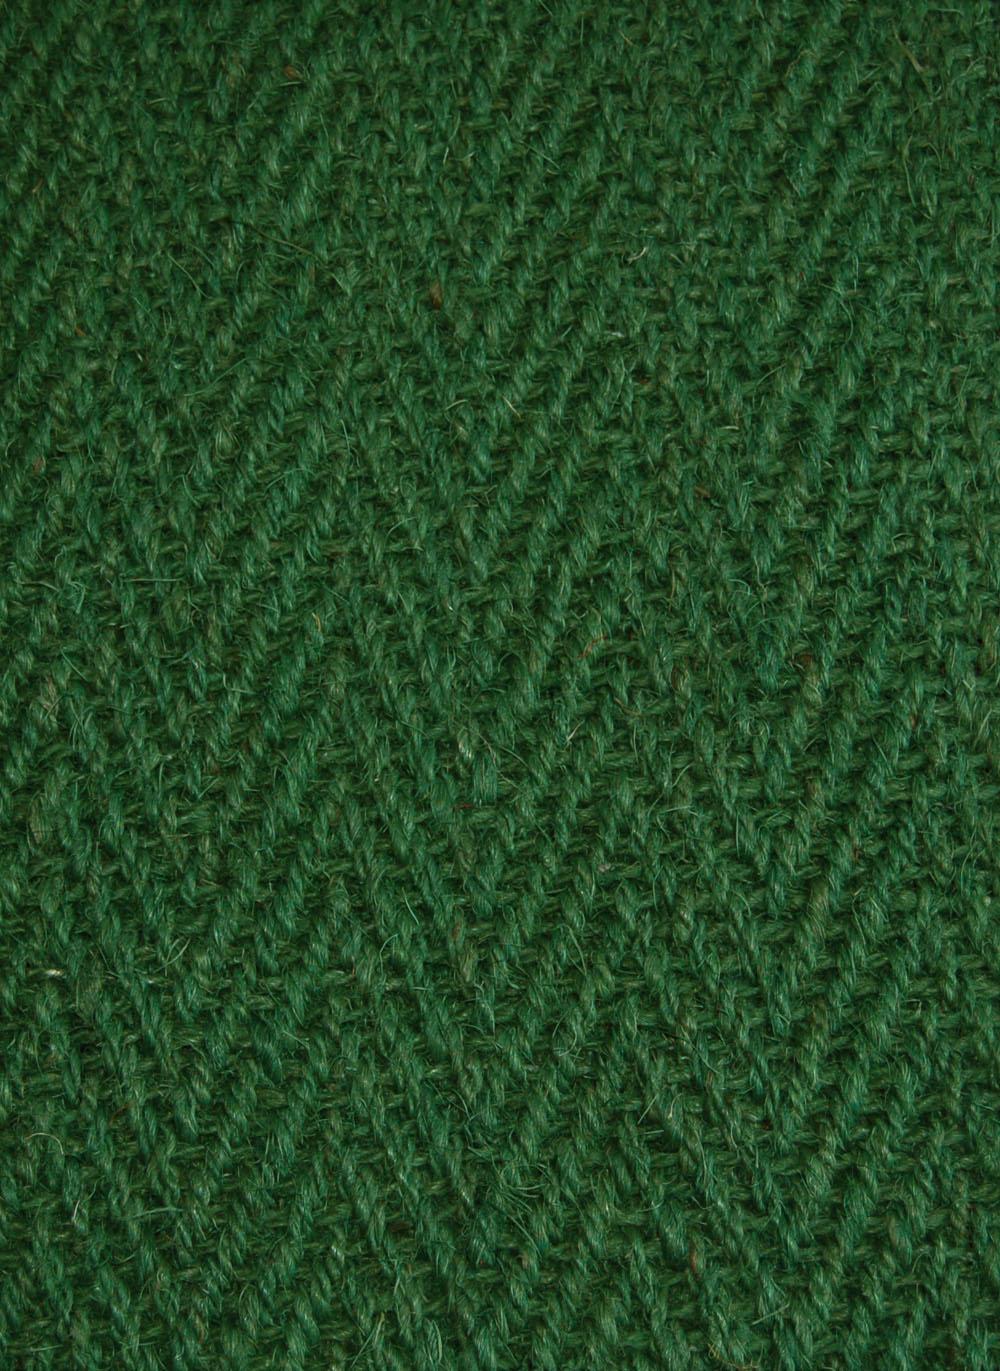 Kokosteppich Grün